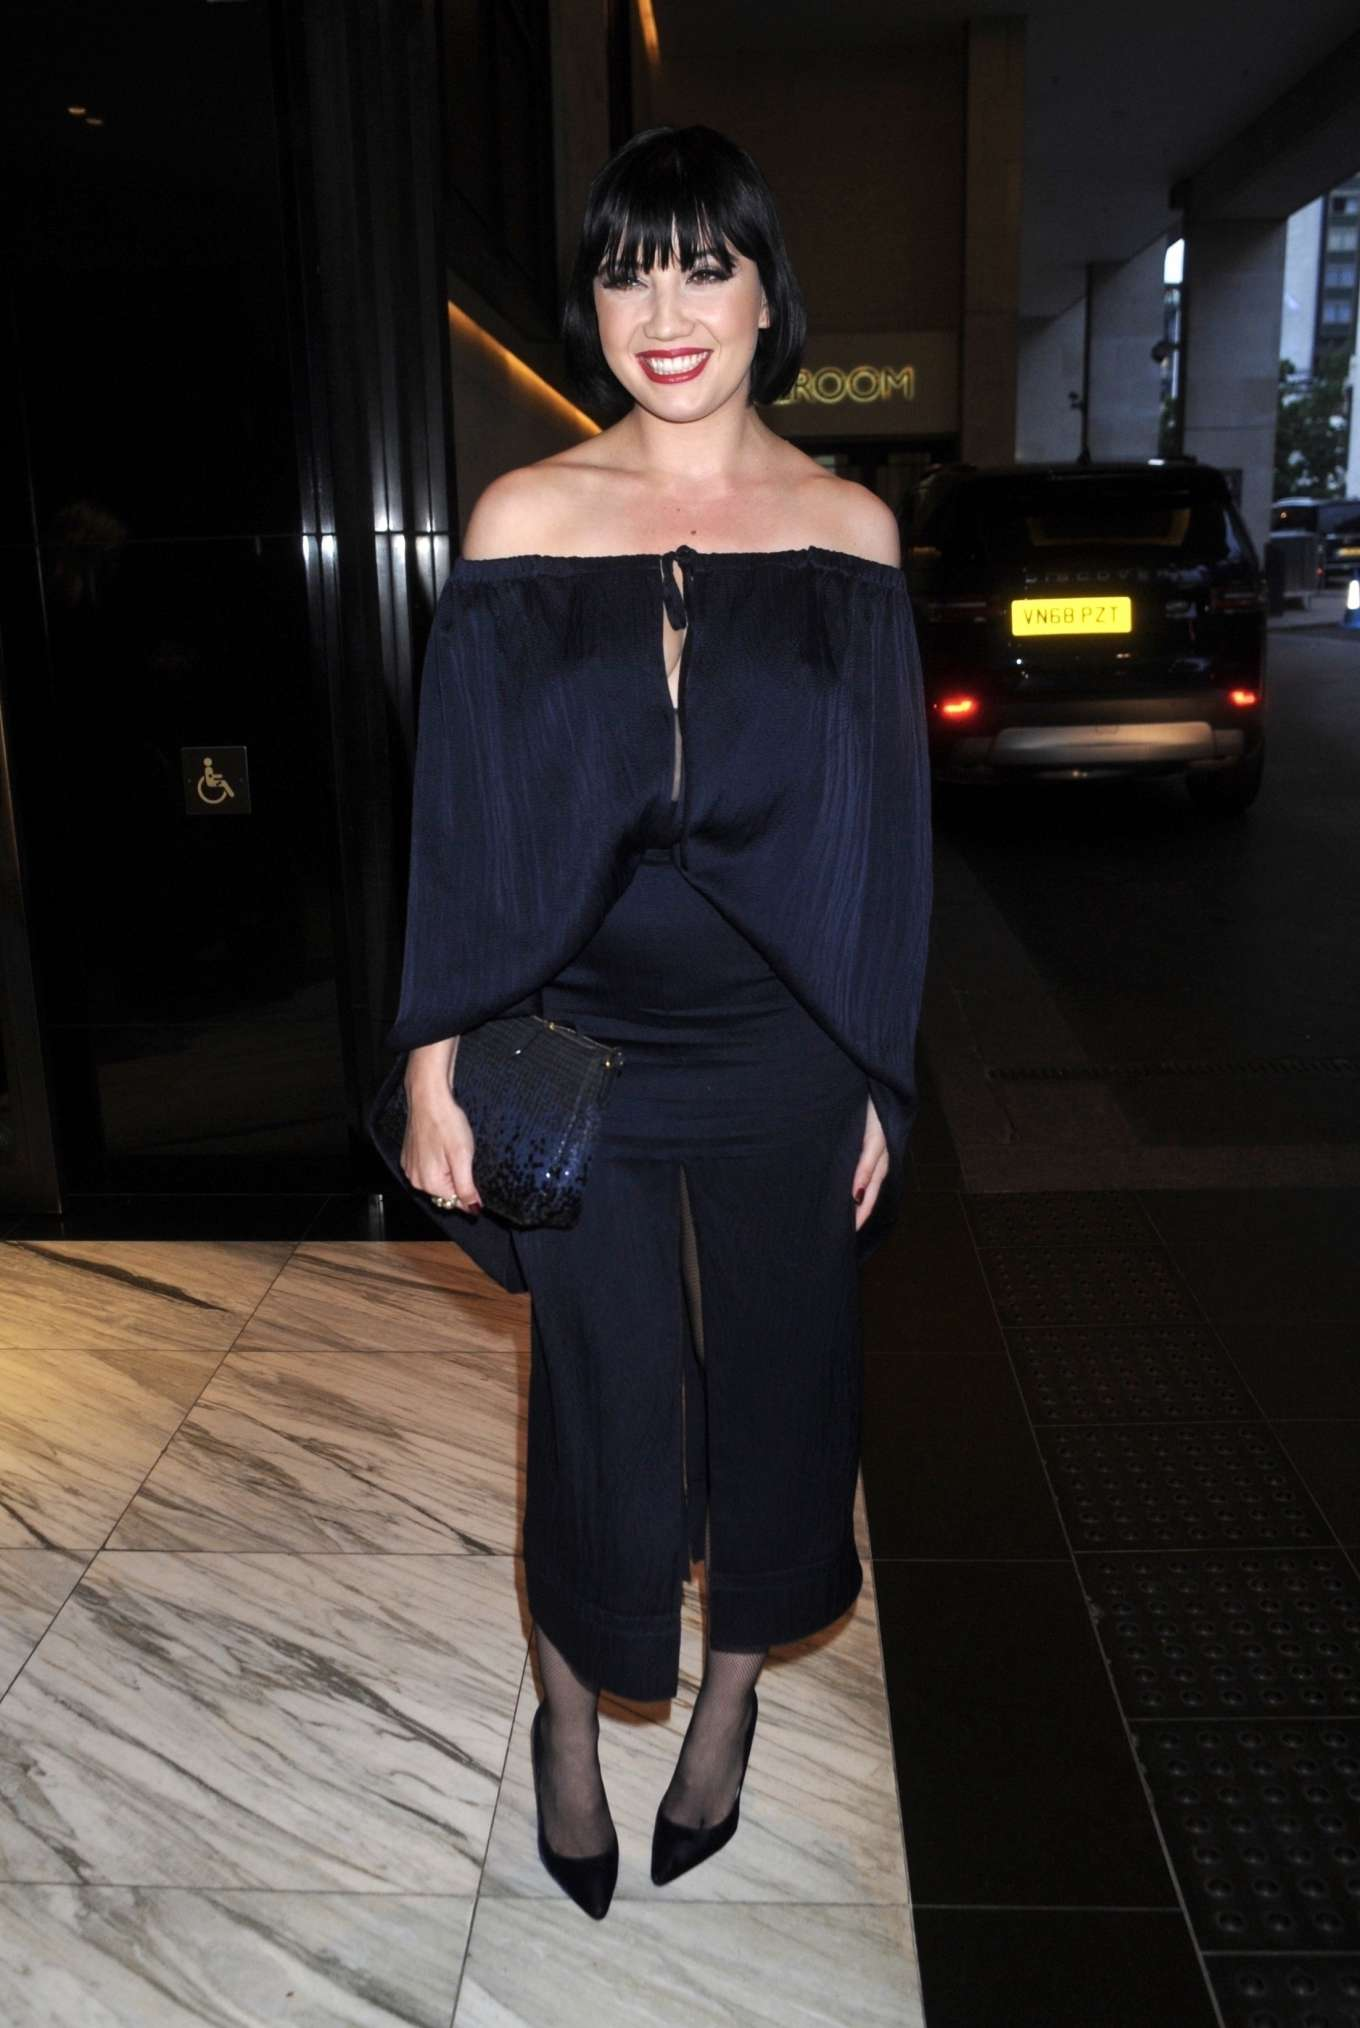 Daisy Lowe - Elite Models London 10 Year Anniversary Party in London